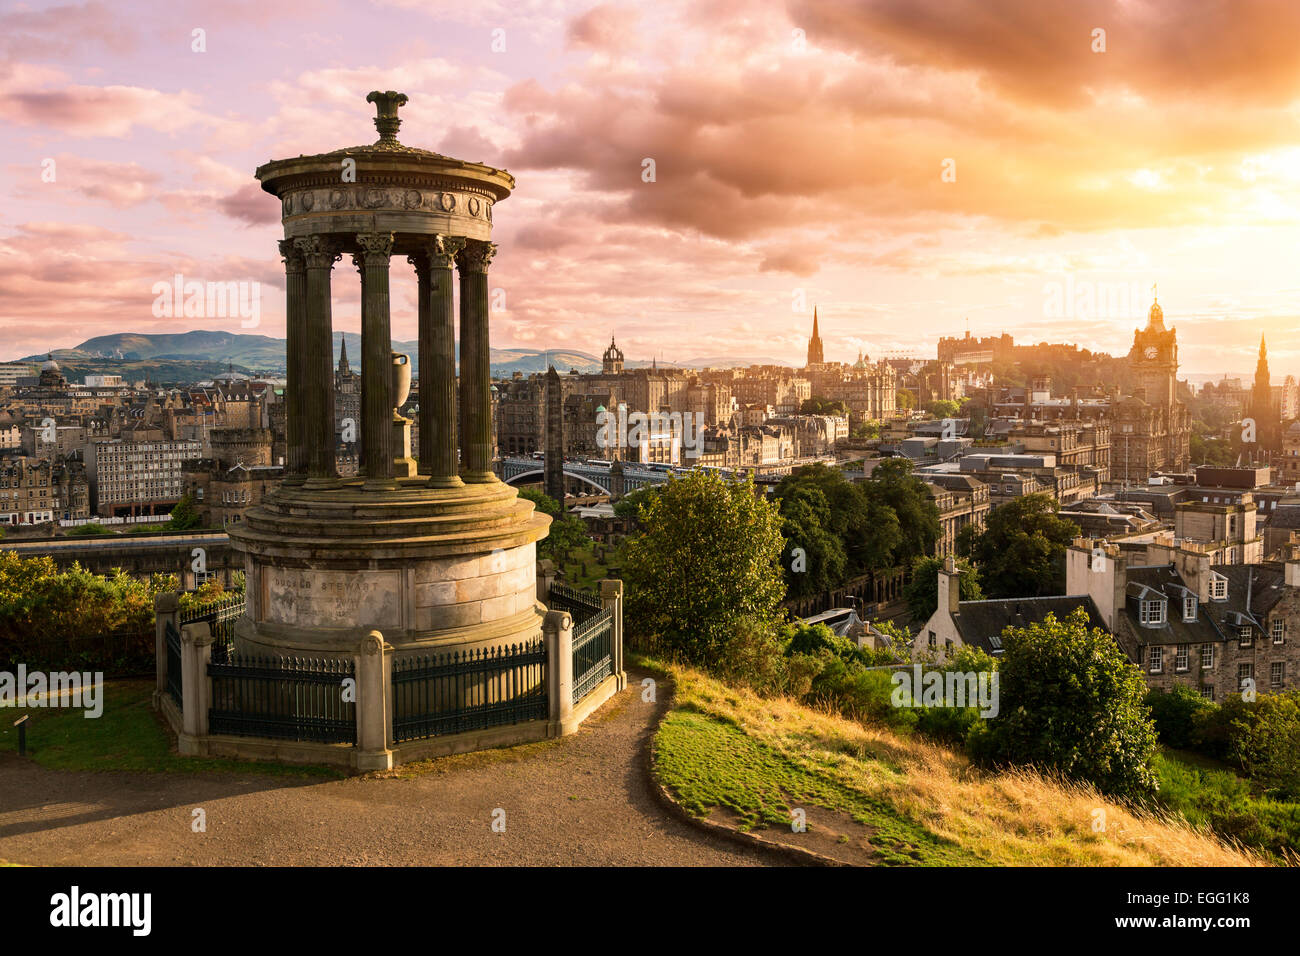 Edinburgh skyline from Calton Hill at sunset - Stock Image